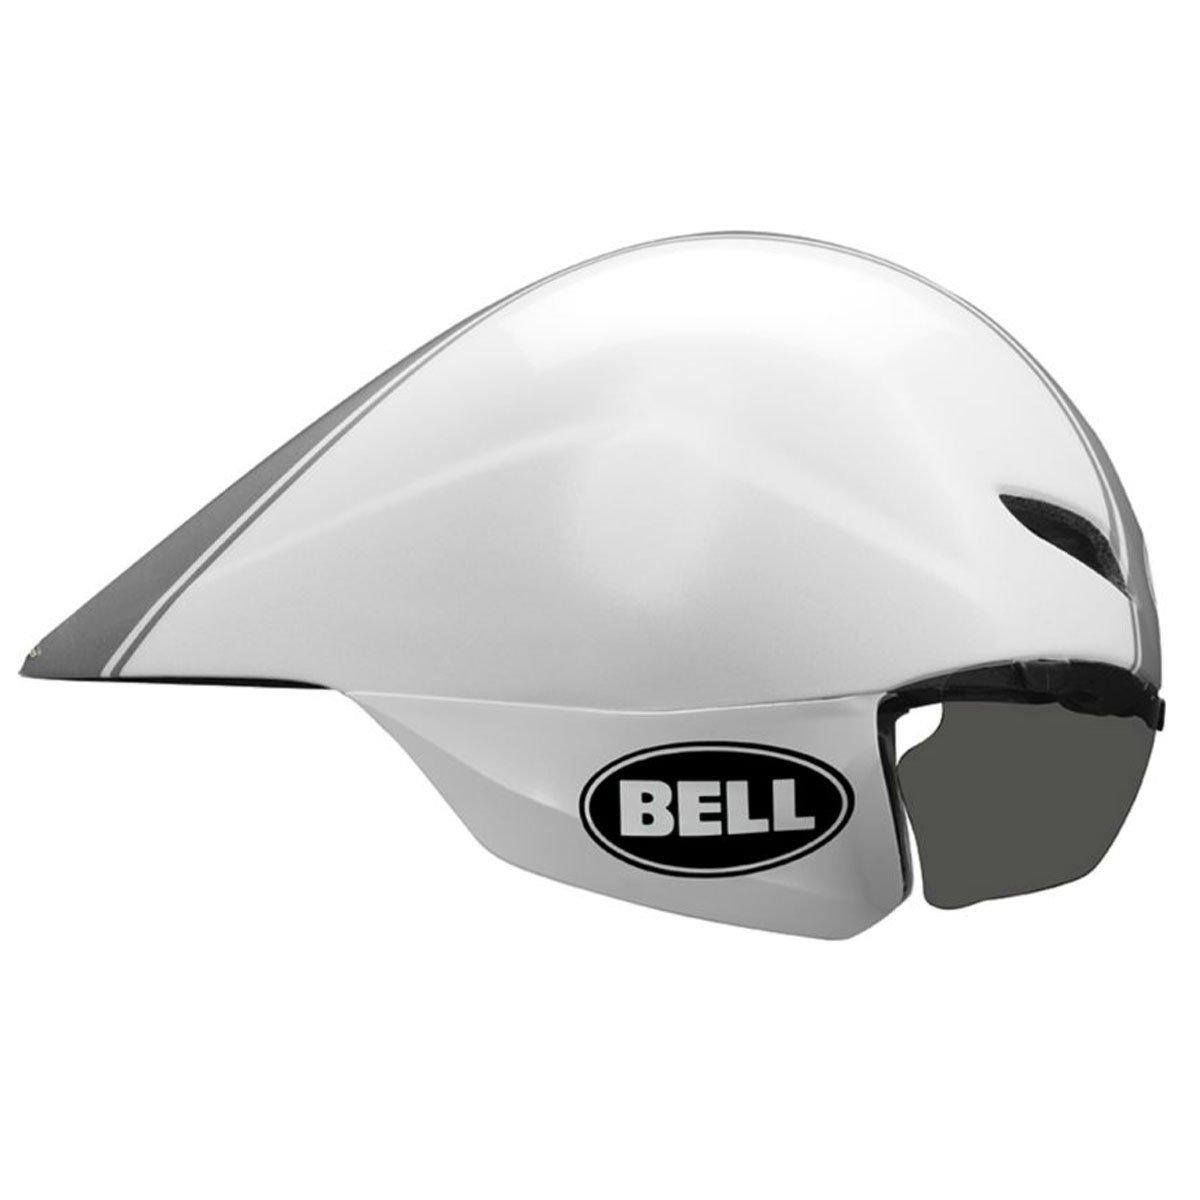 helmet triathlon aero javelin bell helmets trial amazon bike